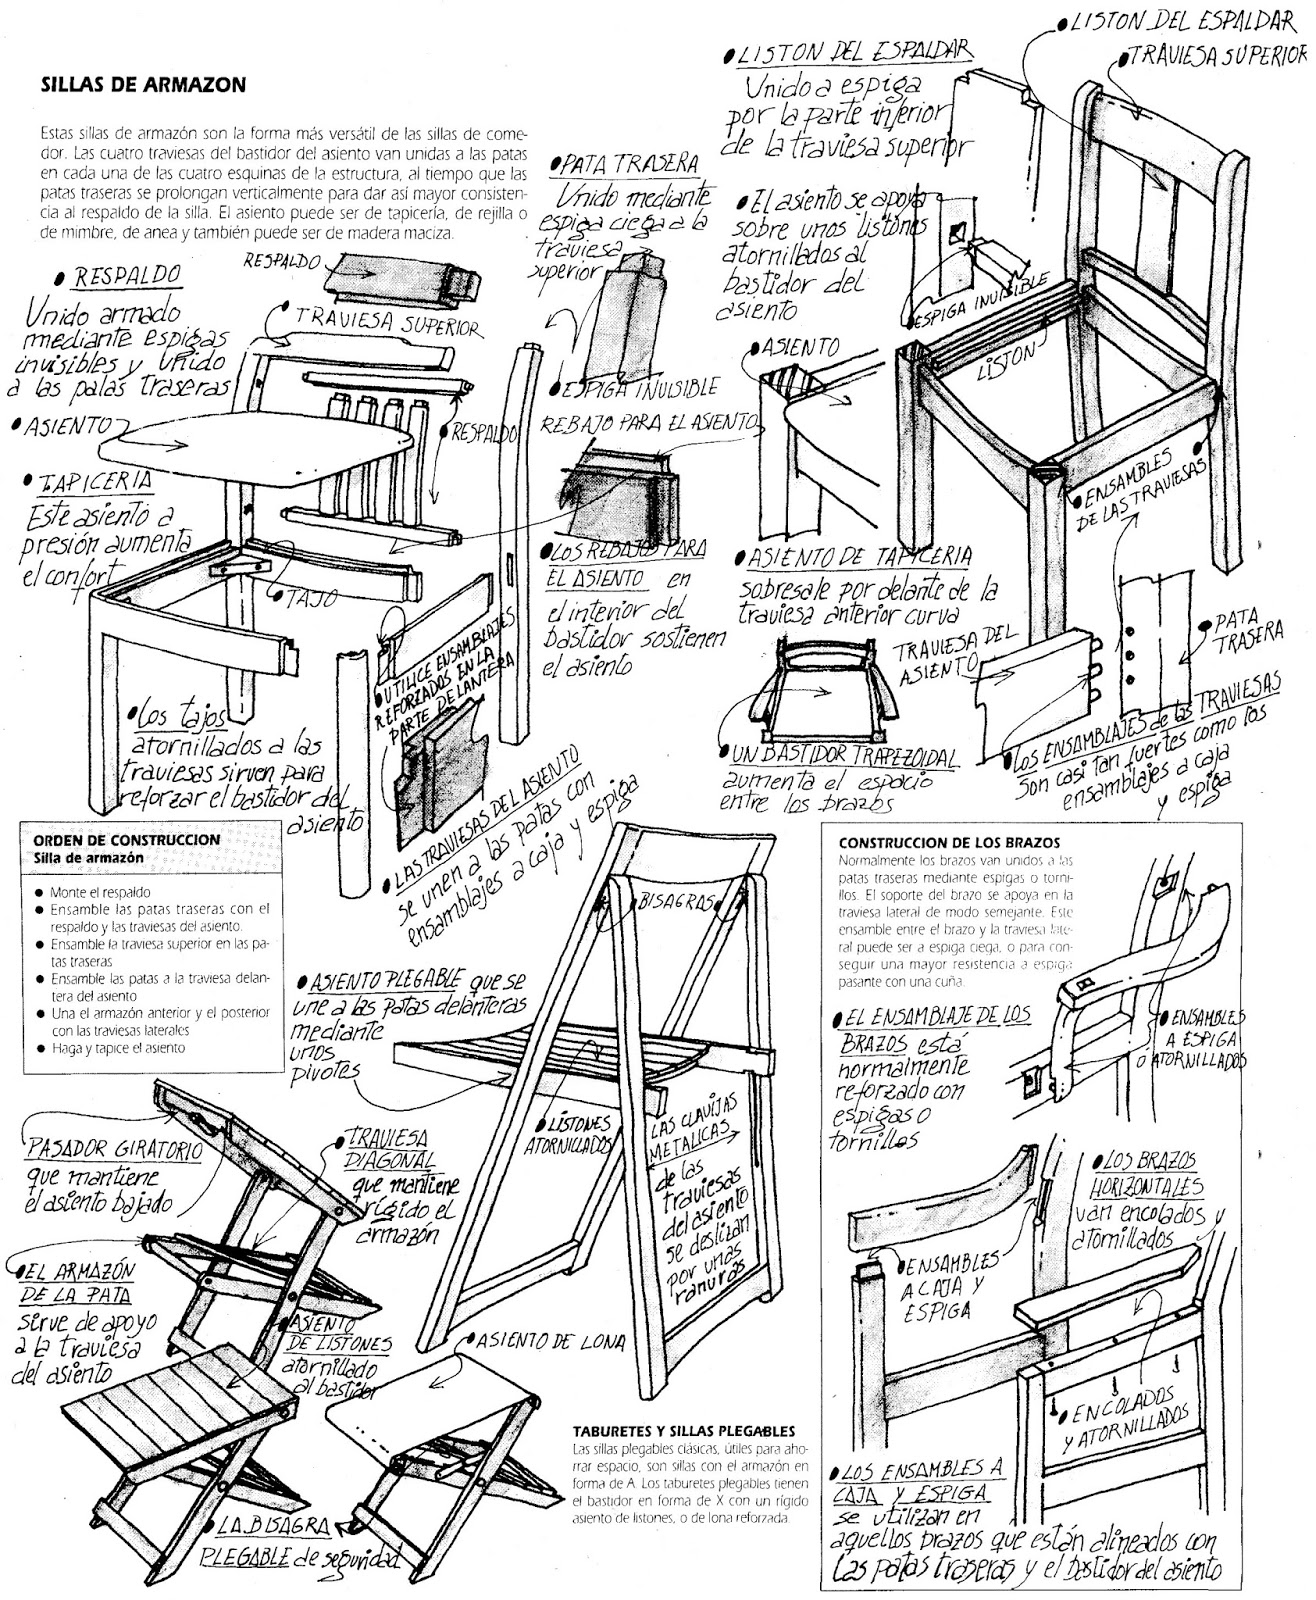 Ebanister a y carpinter a planos para construcci n de sillas for Planos de construccion